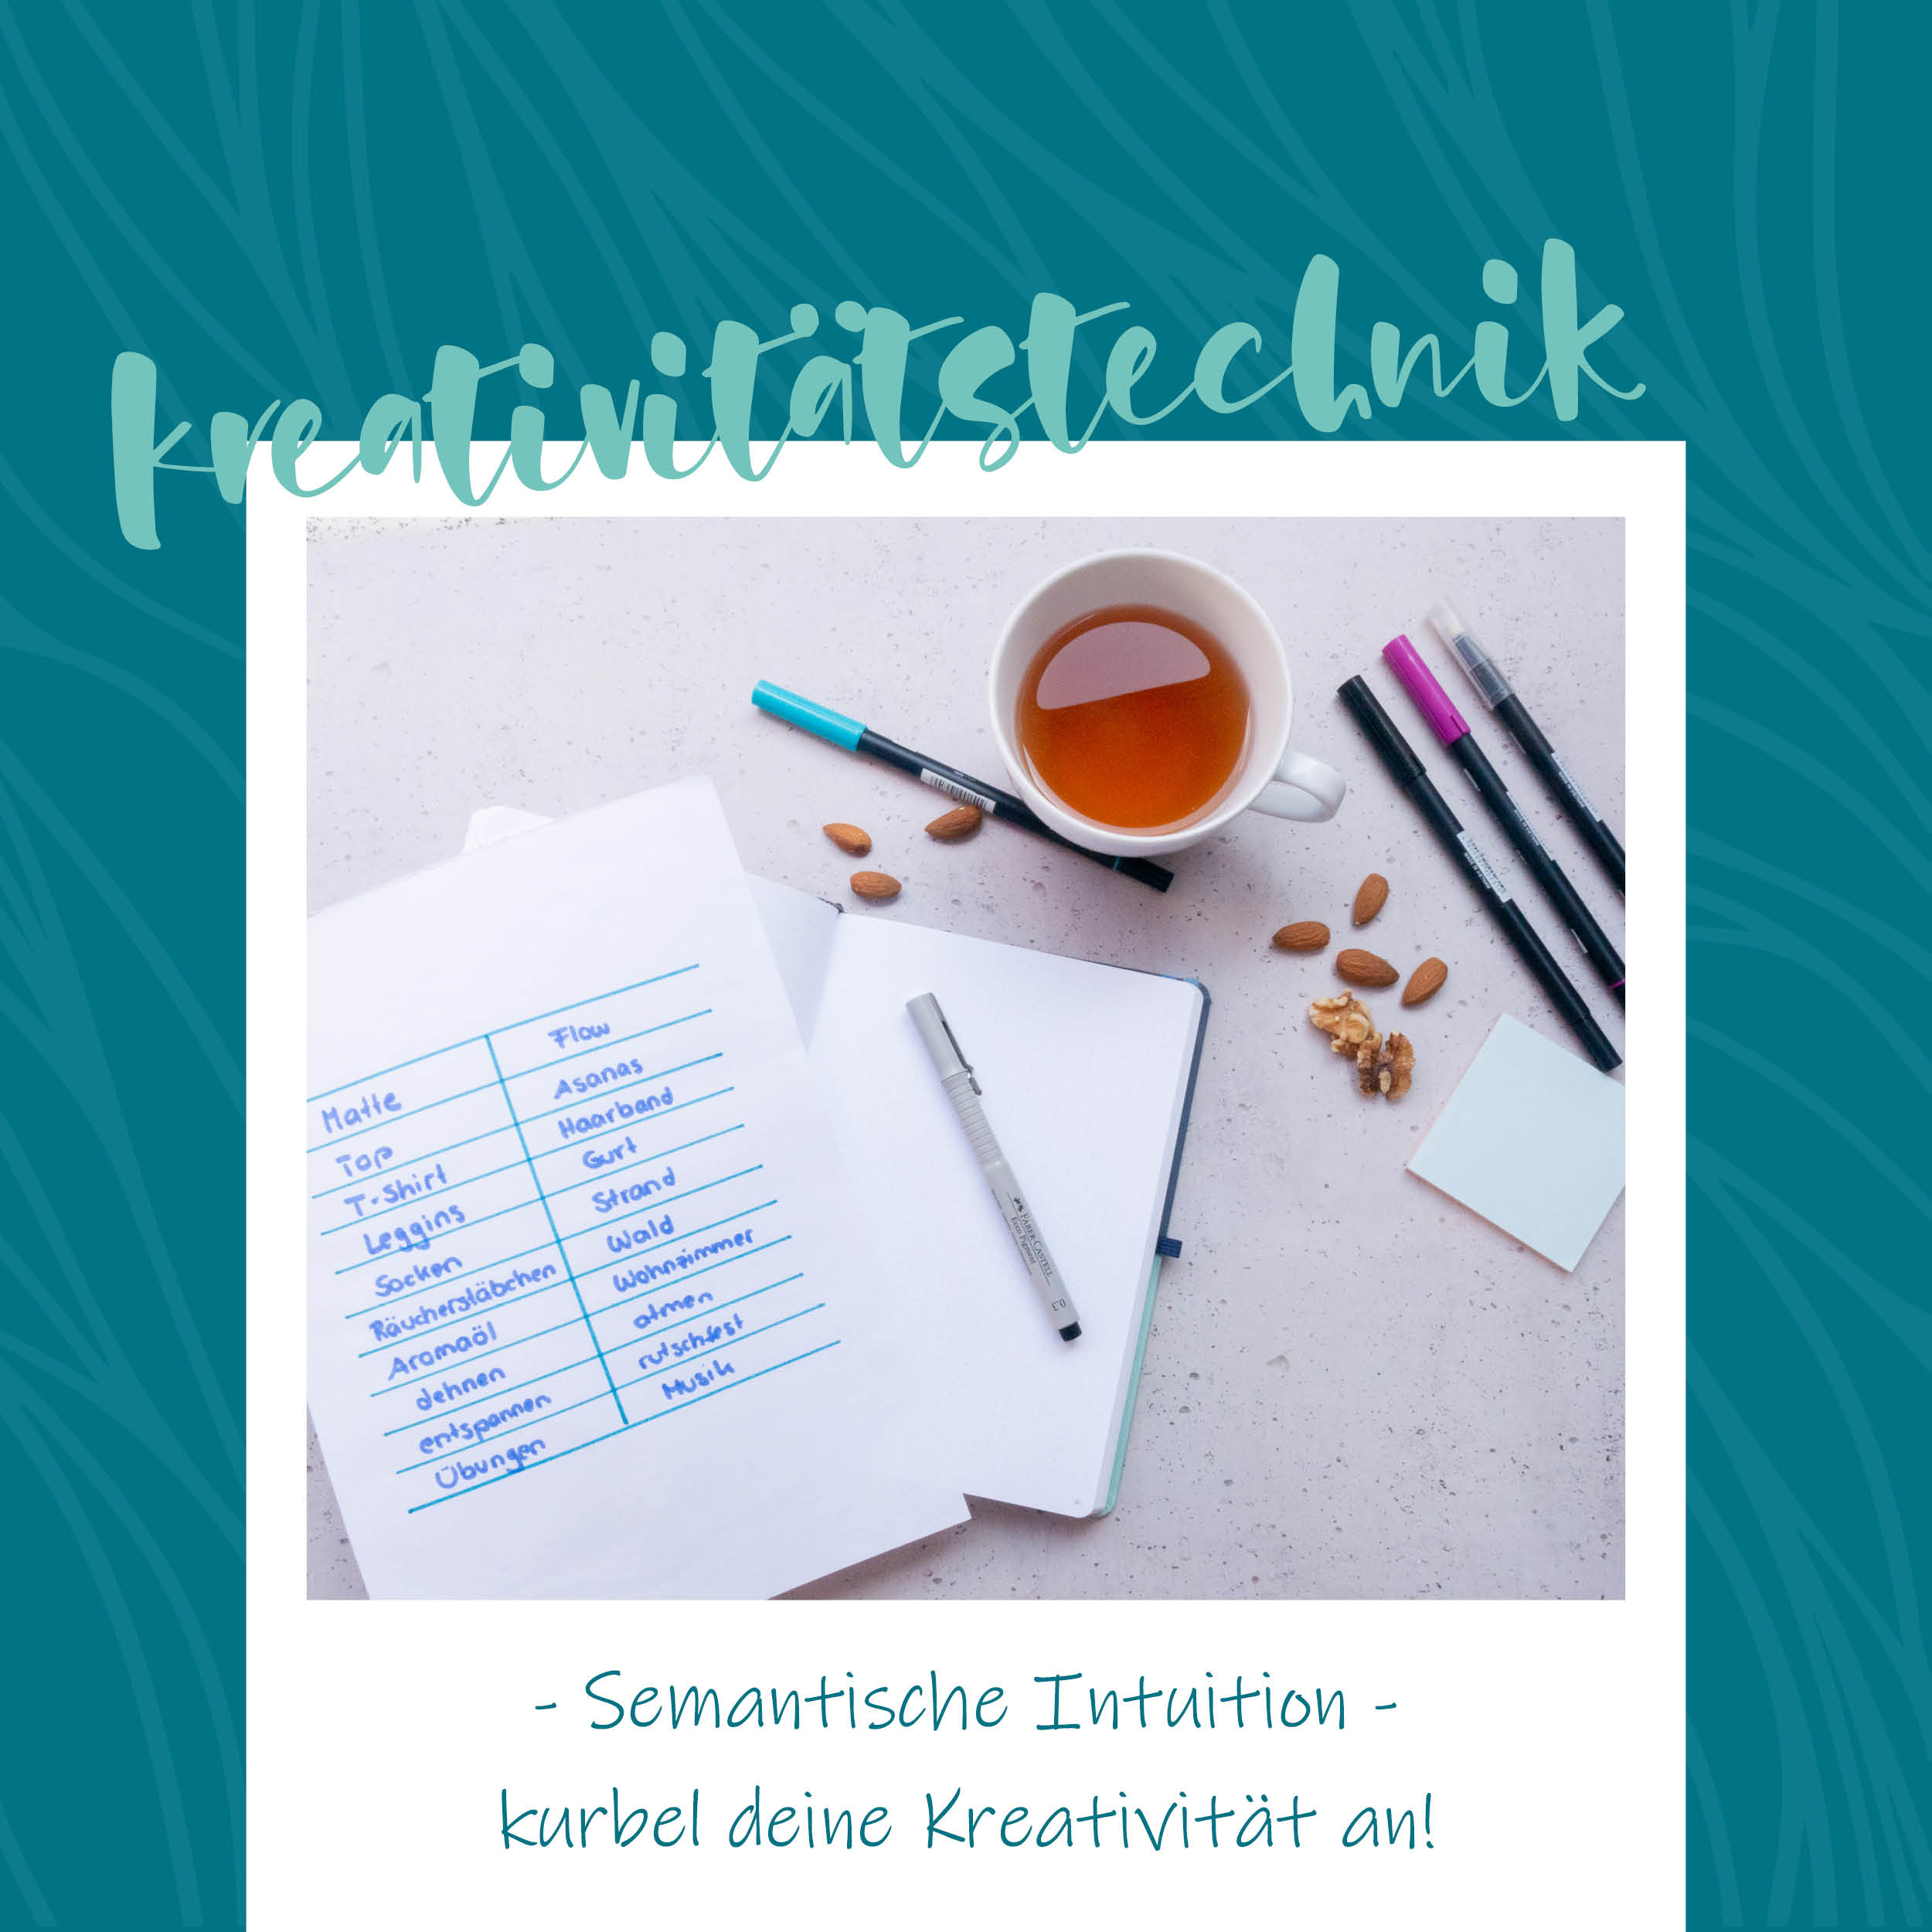 blauerEisberg_Kreativitätstechnik_SemantischeIntuition